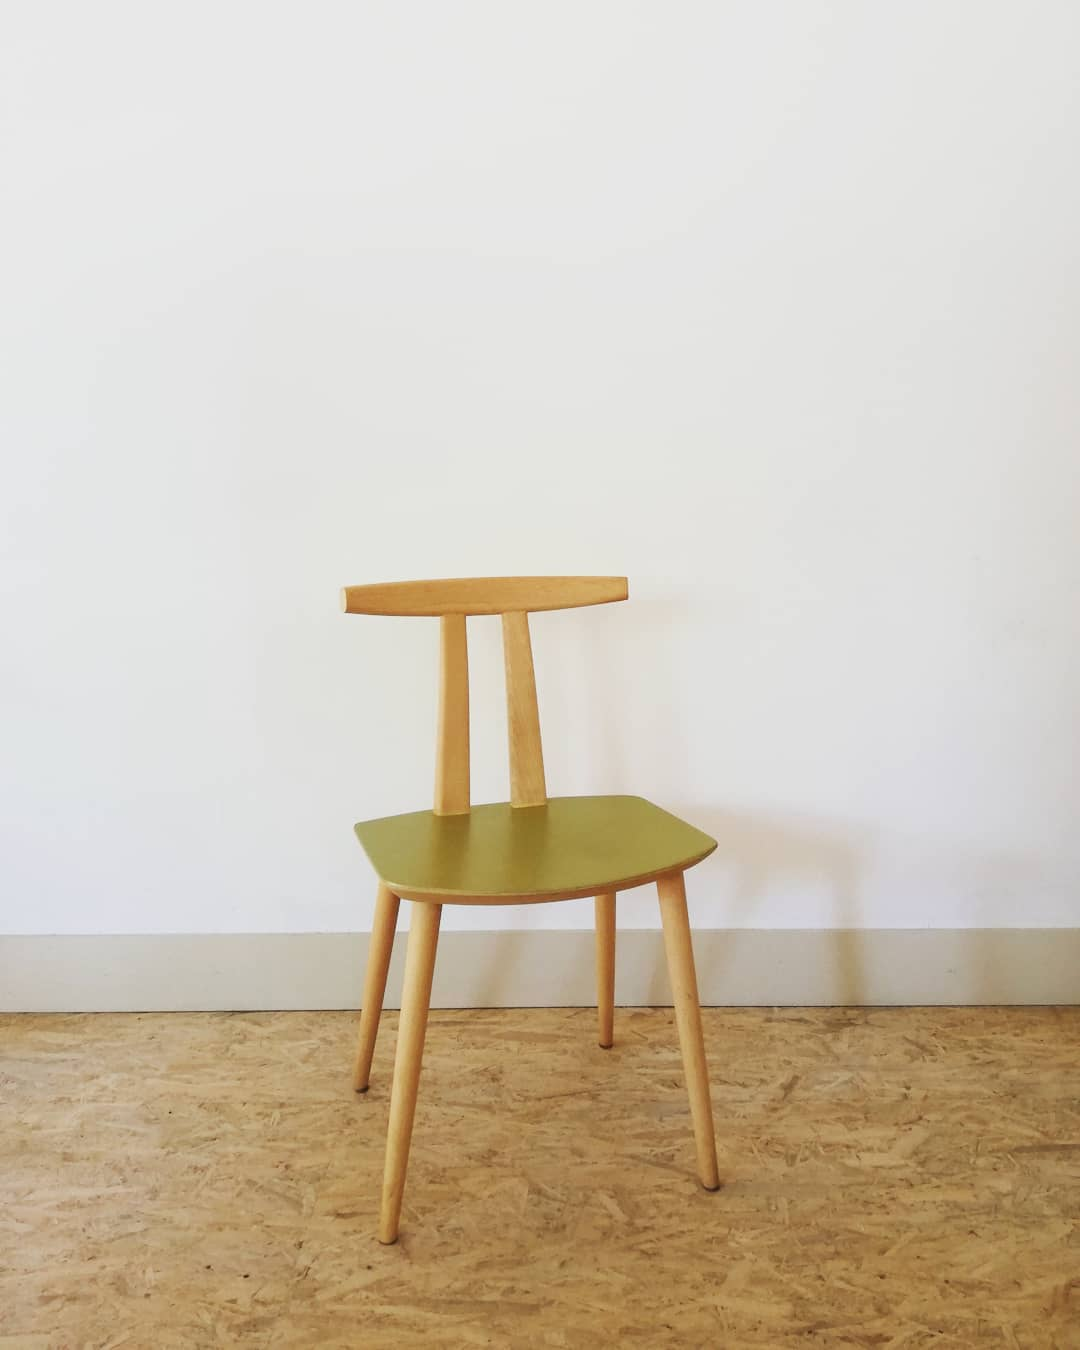 chaise danoise or